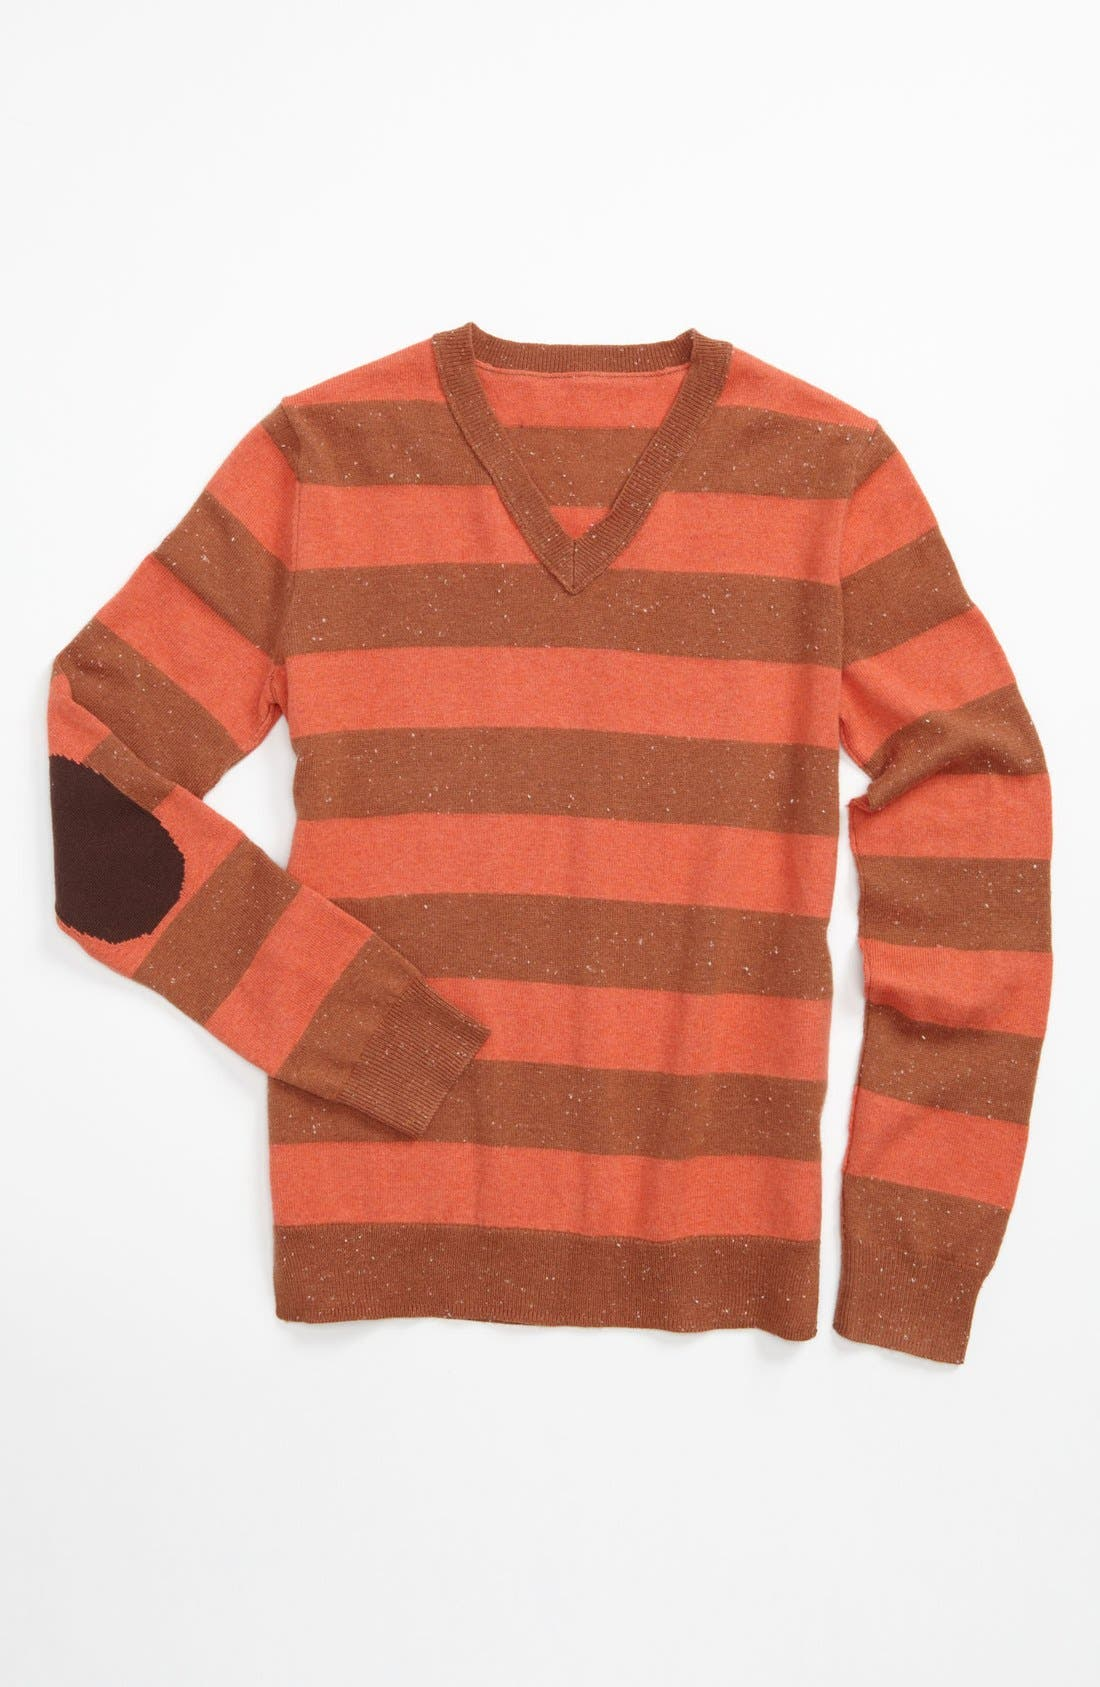 Alternate Image 1 Selected - Tucker + Tate 'Janie' Stripe Sweater (Big Girls)